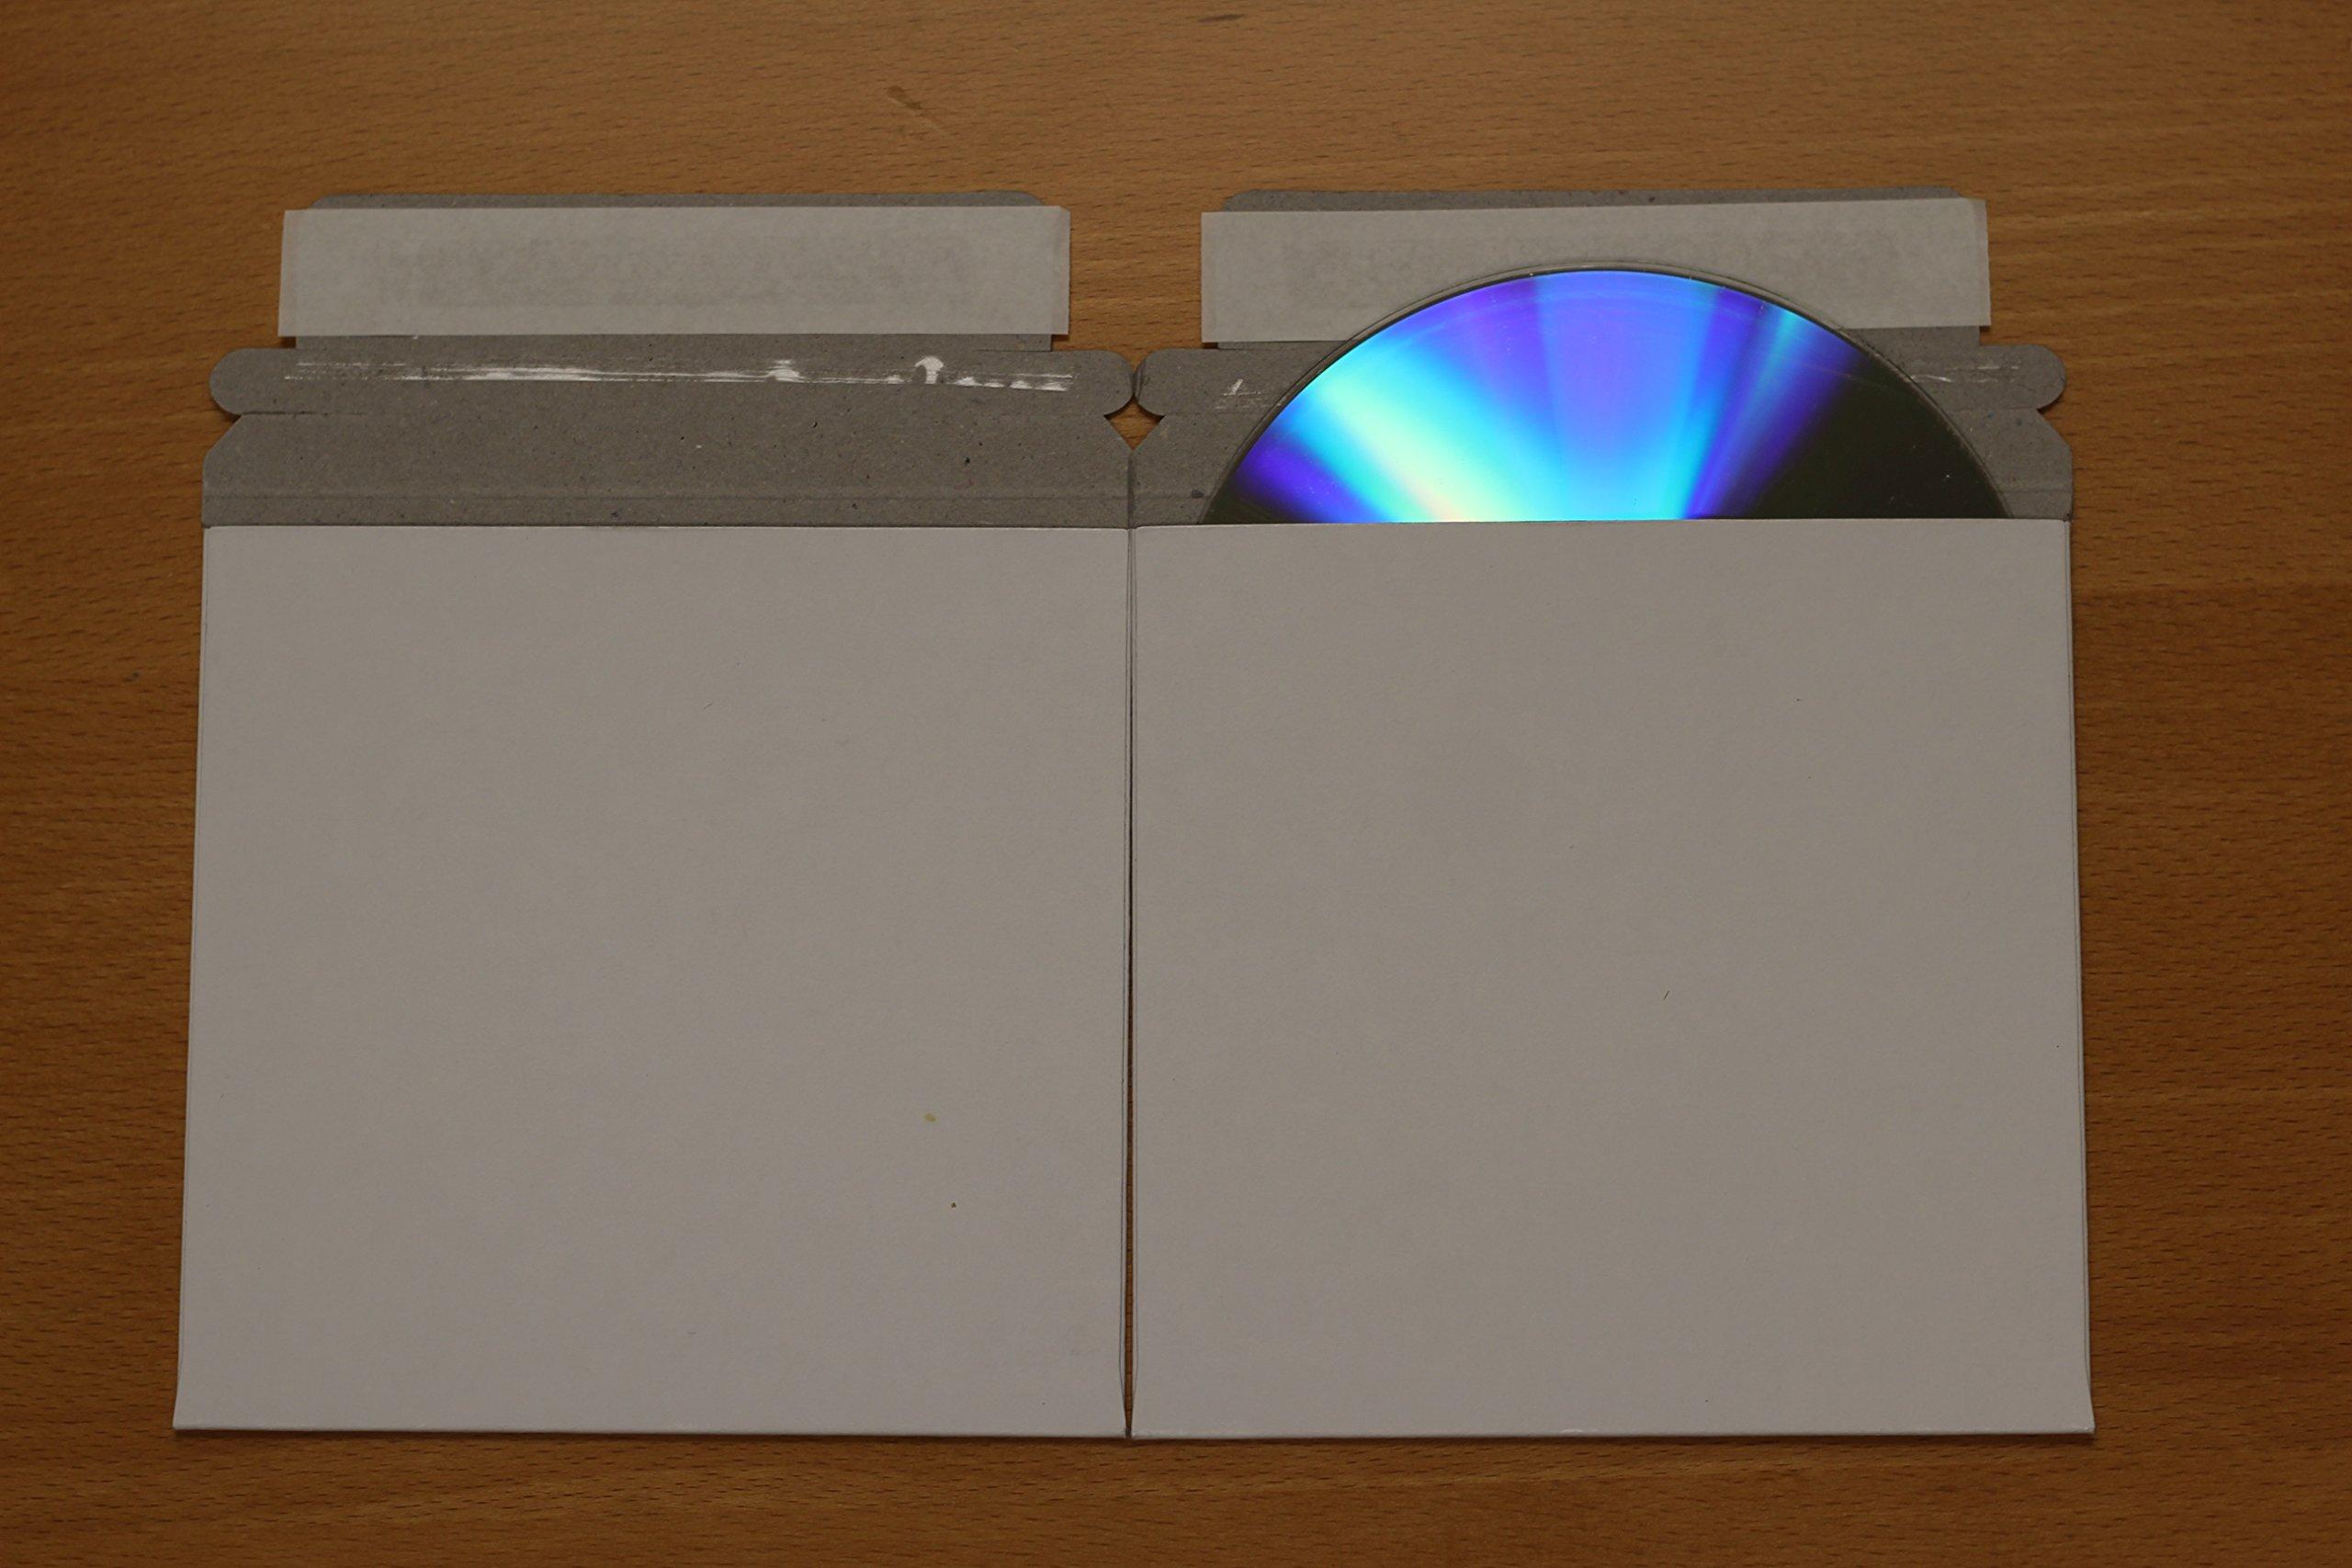 AmeriCopy CD/DVD White Cardboard Mailers, Self Sealing w/ Flap (5'' x 5'') (50 Pieces)